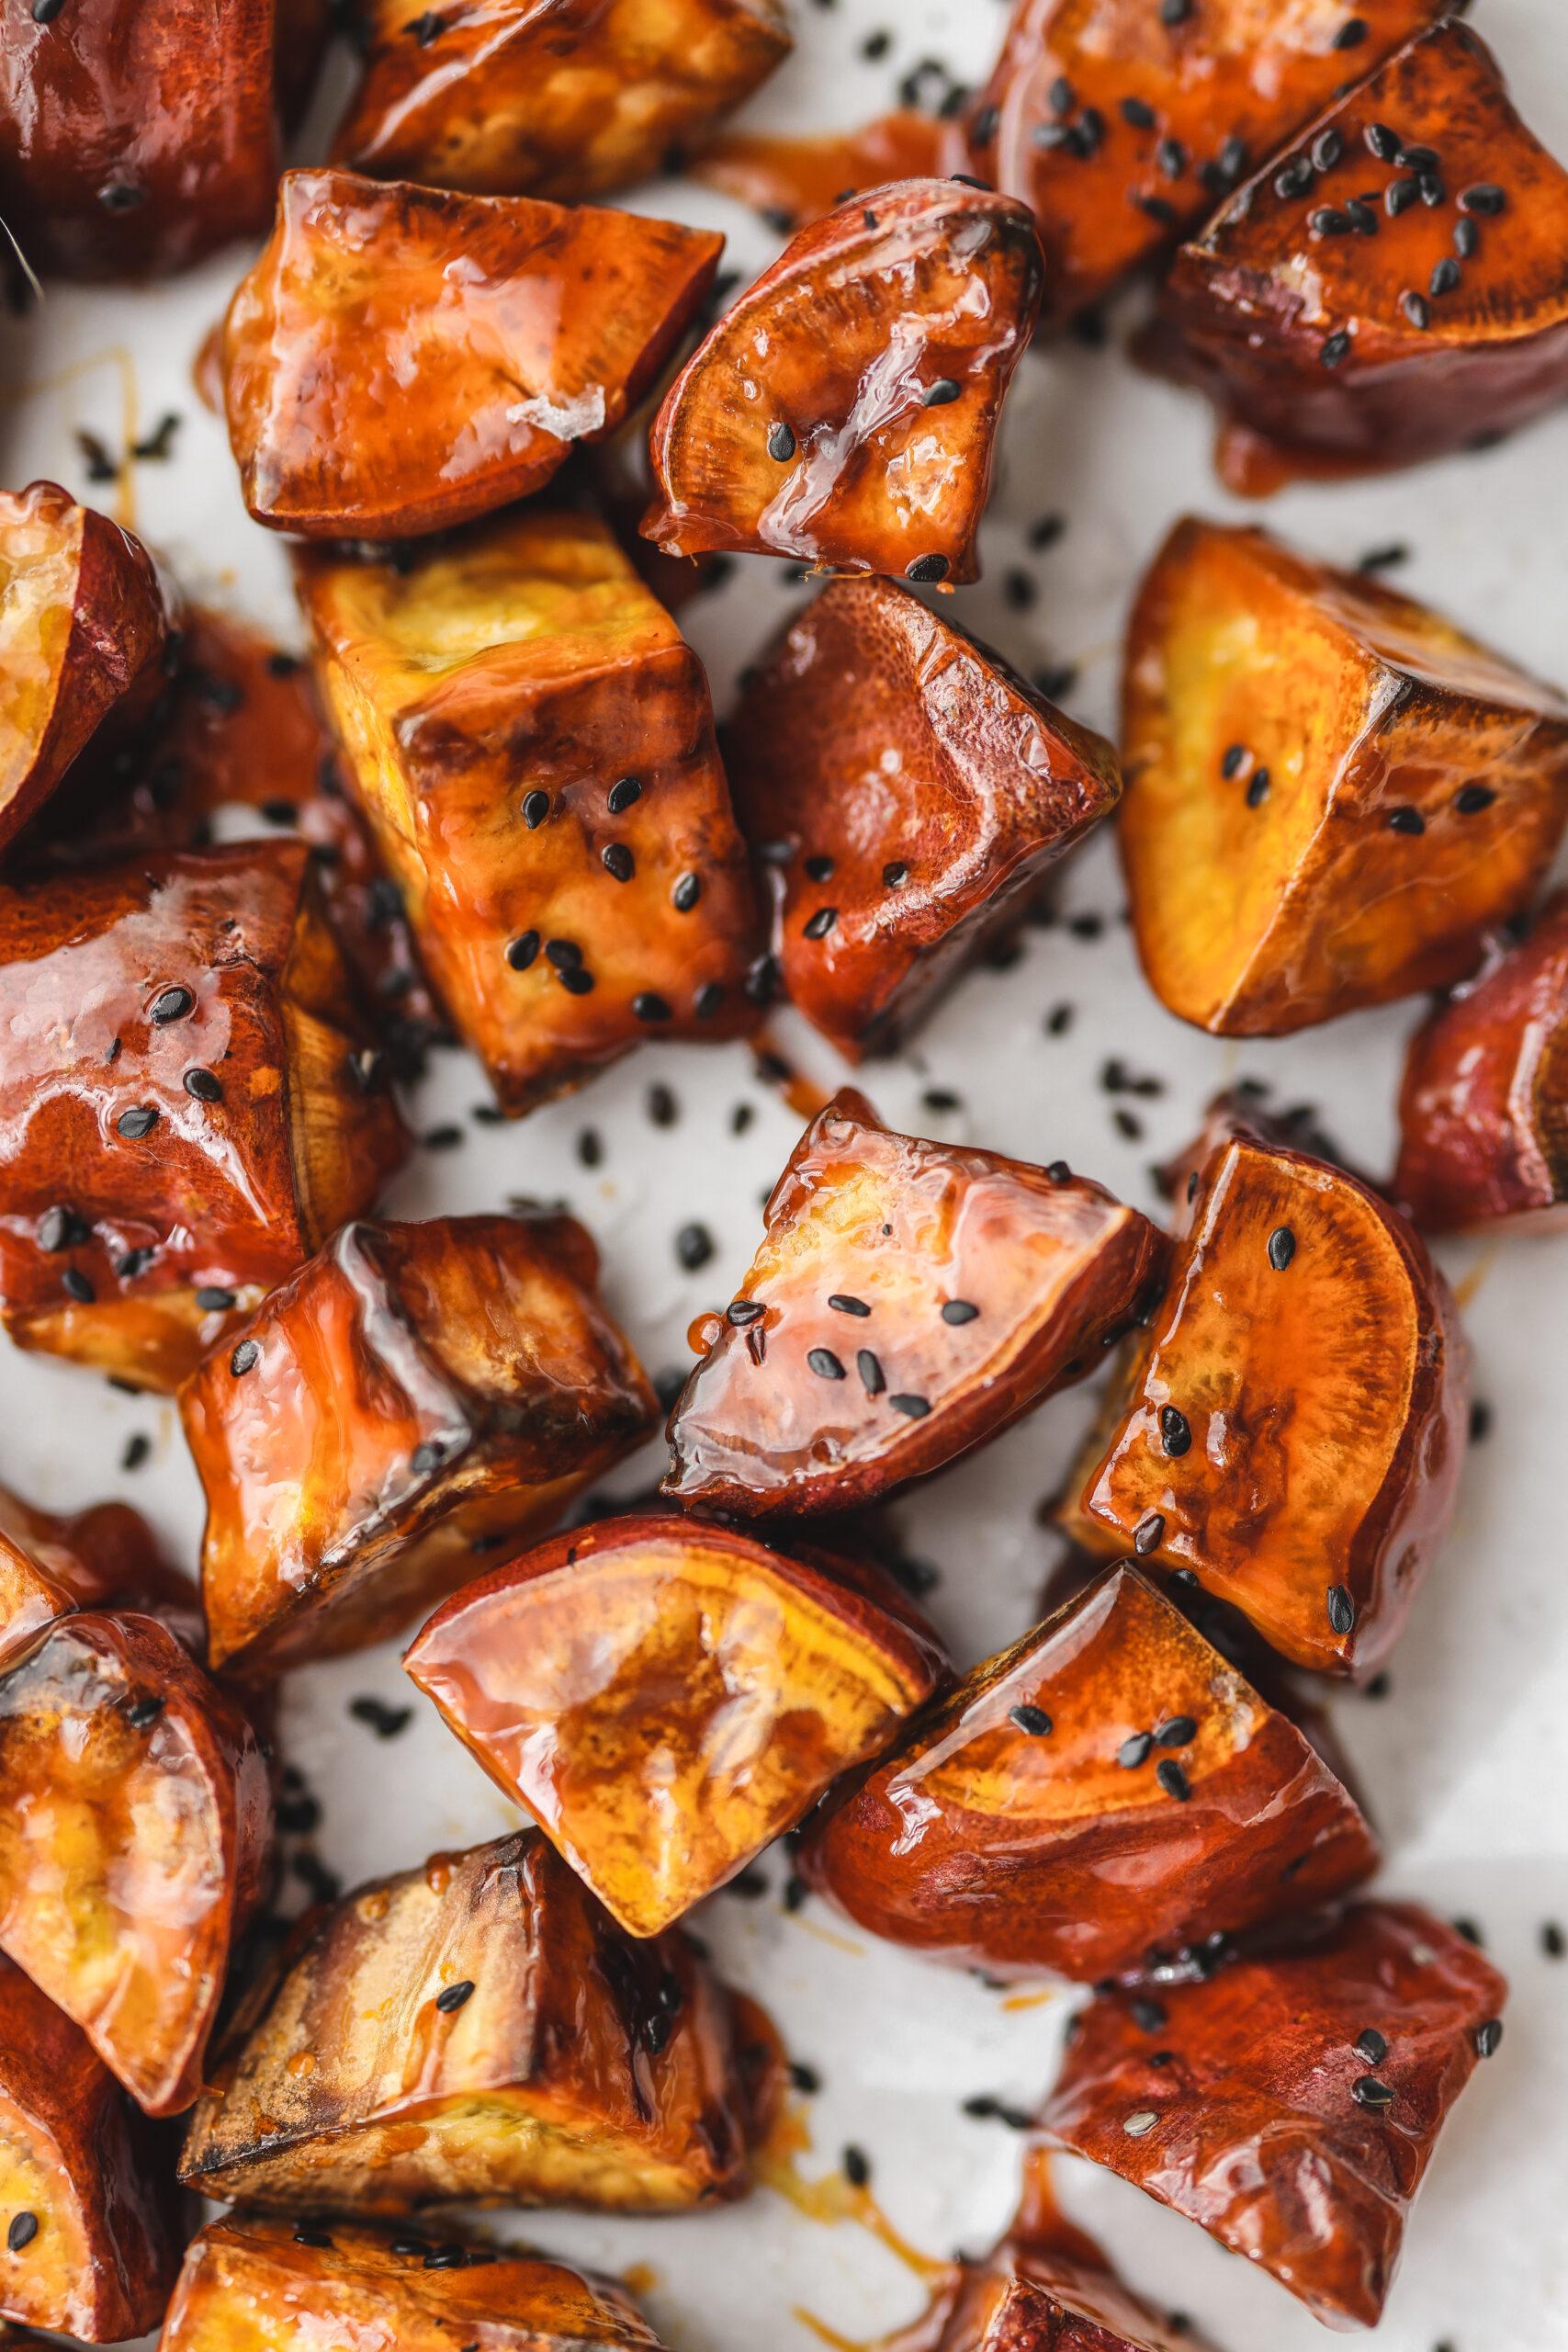 Korean Candied Sweet Potato (Goguma Mattang)